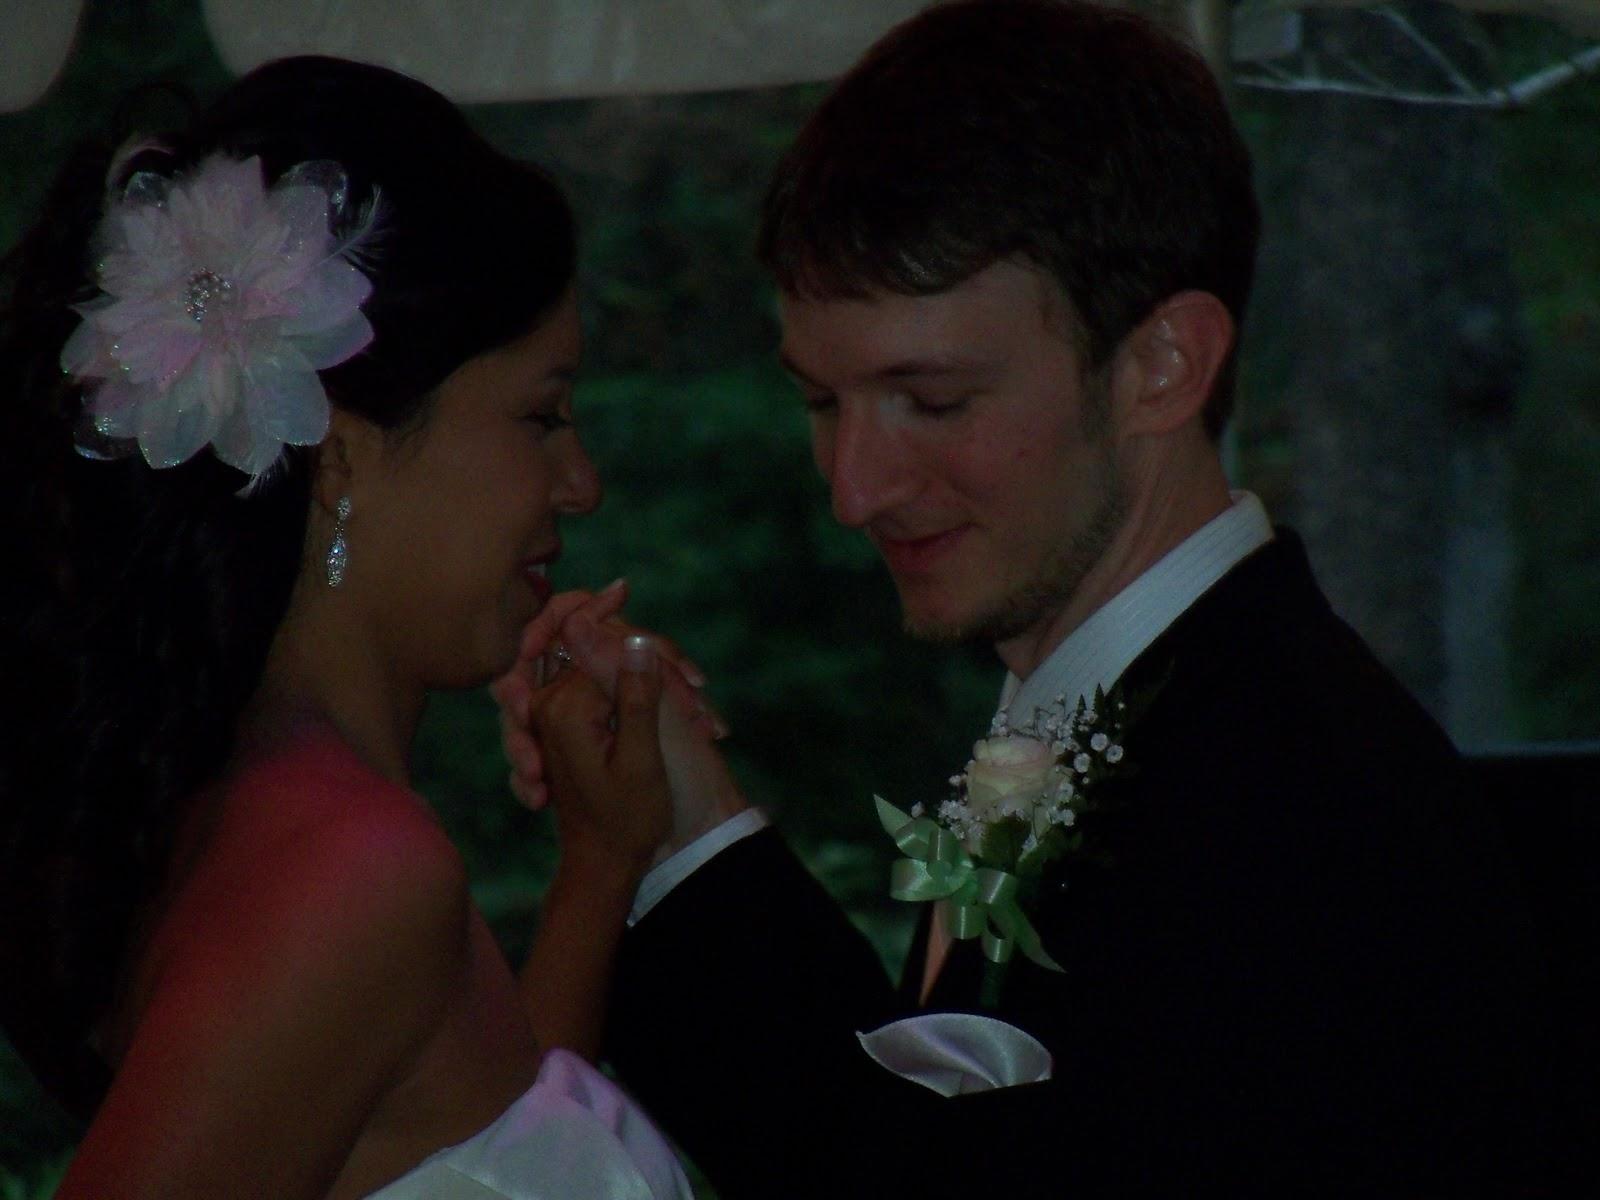 Ben and Jessica Coons wedding - 115_0835.JPG